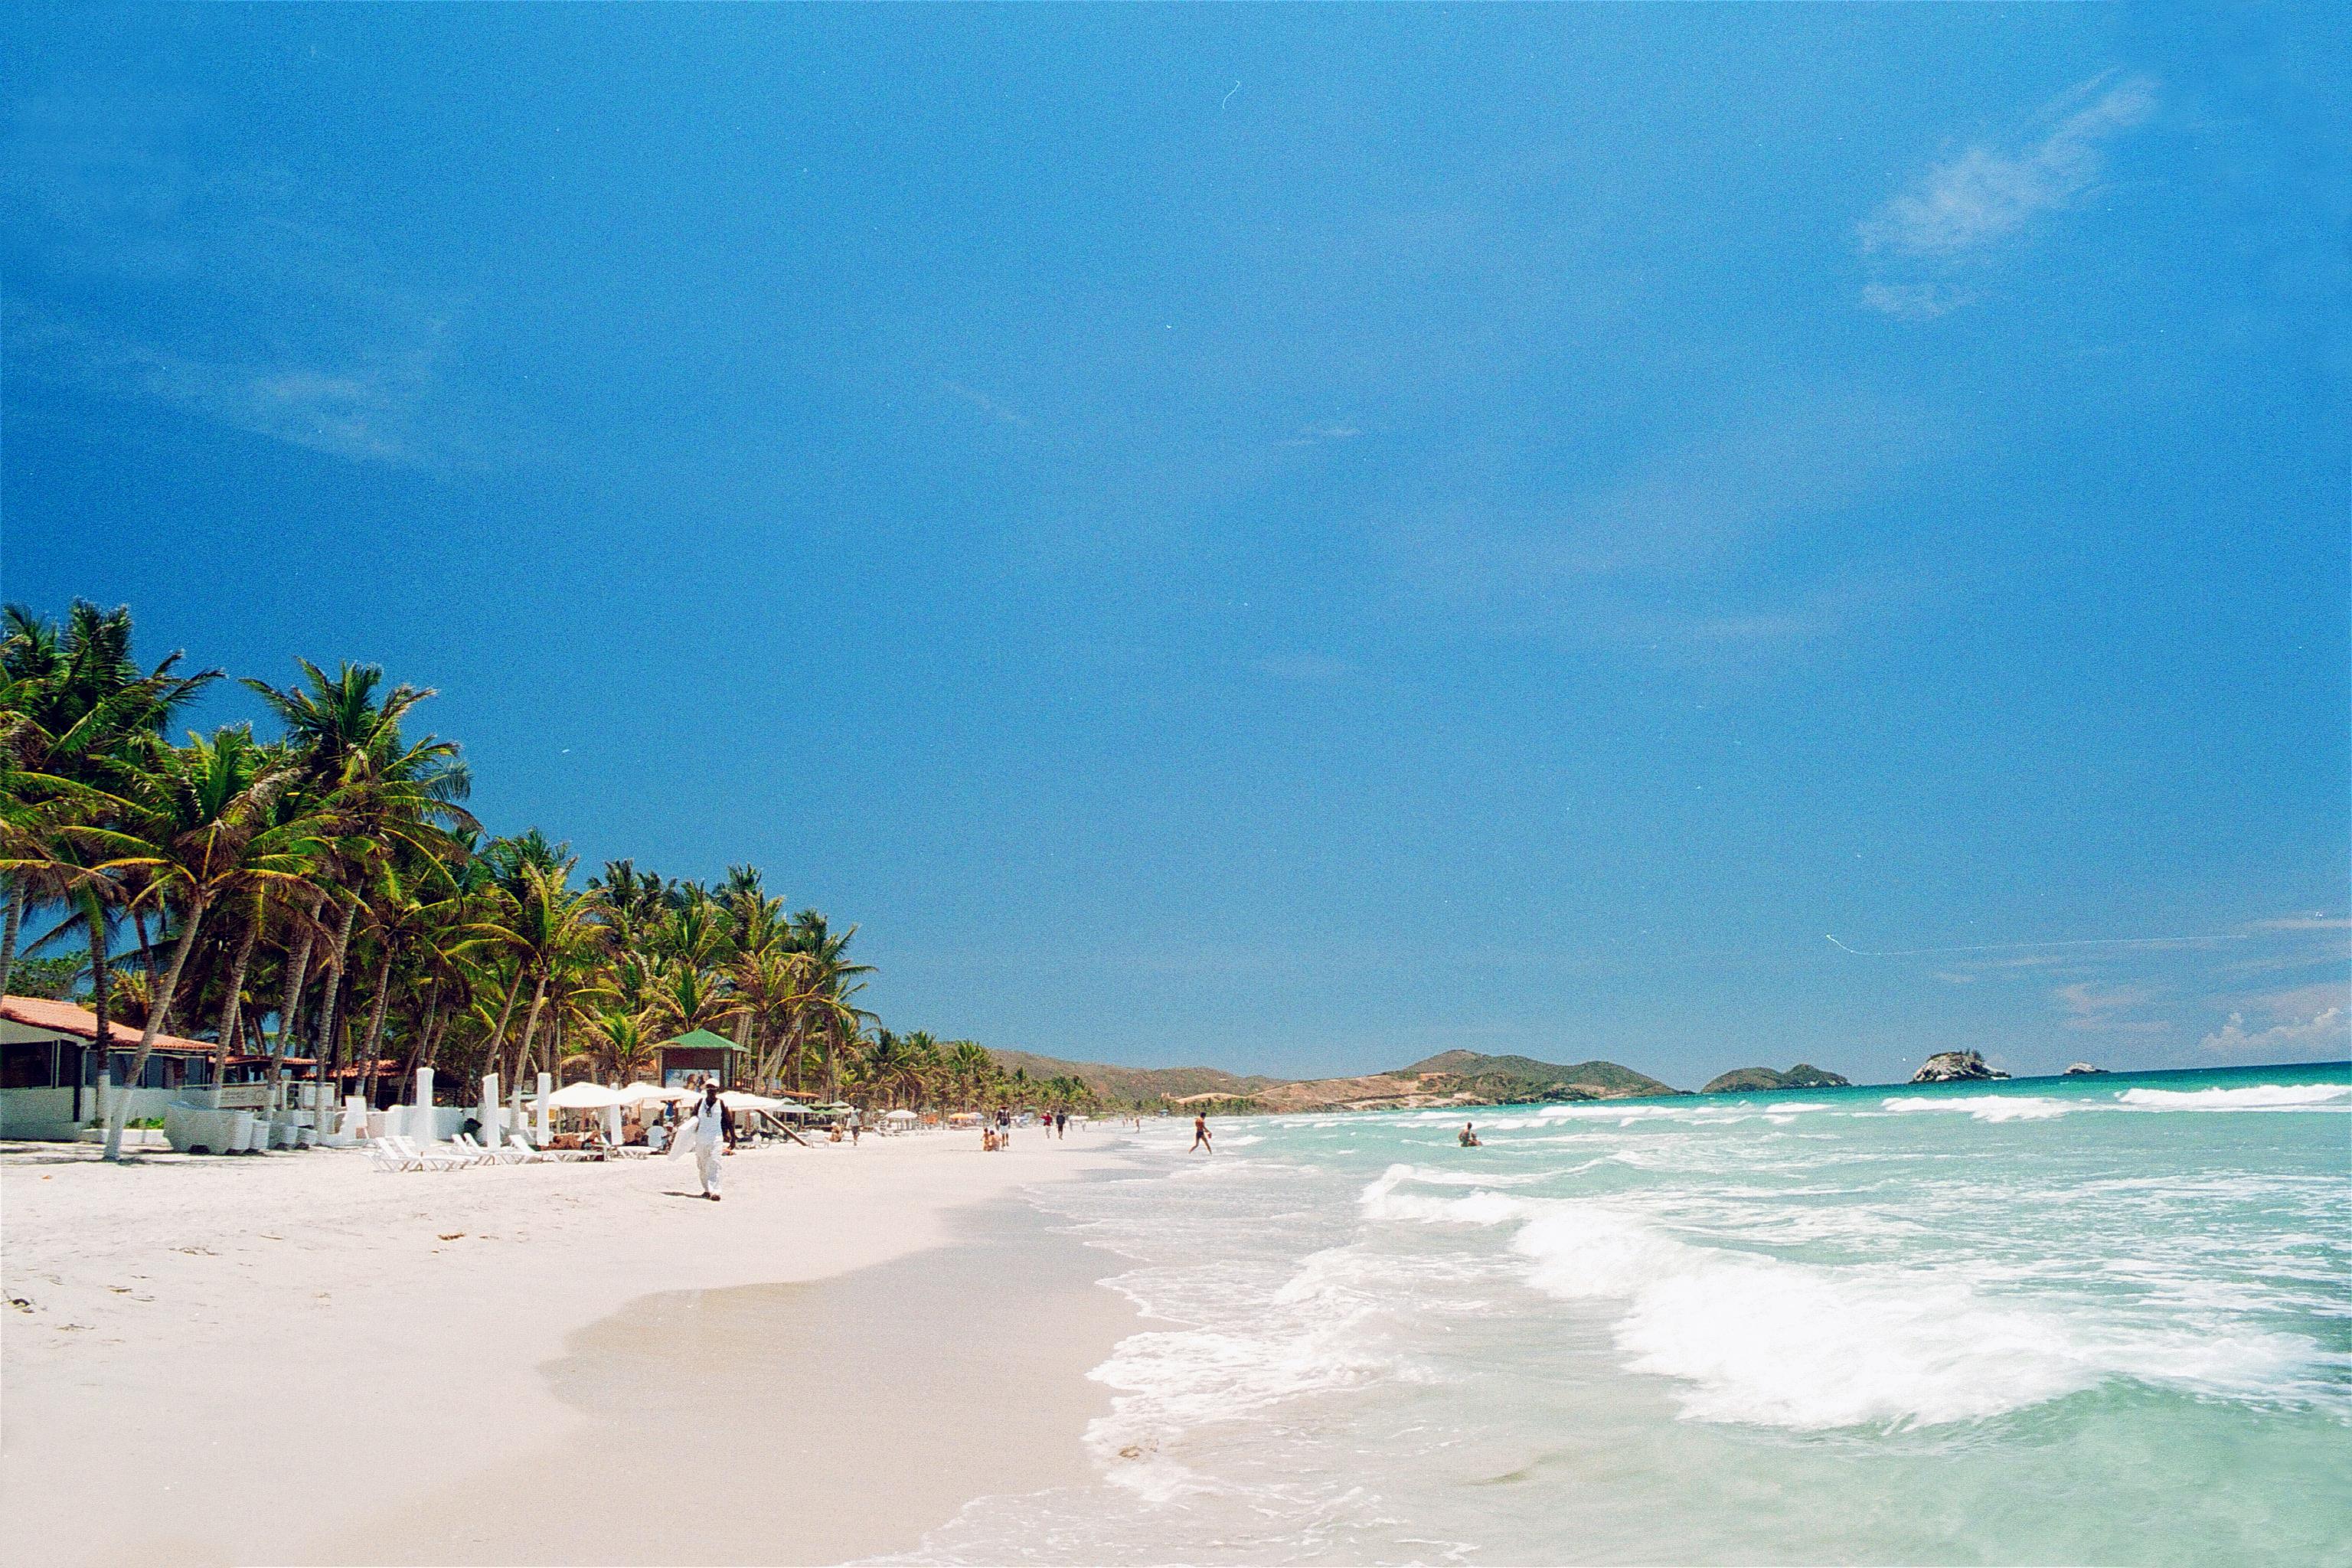 Cali Colombia Beach Resorts